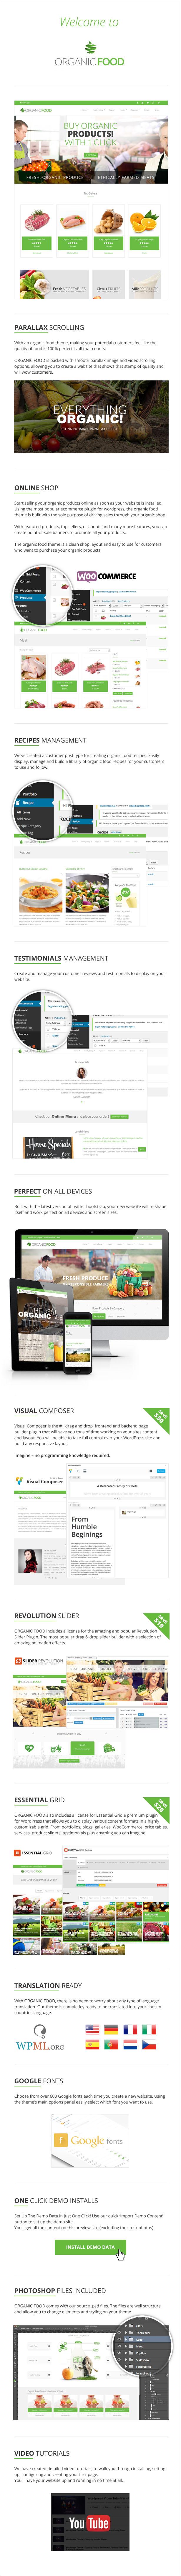 OrganicFood | Responsive WordPress Theme - 8